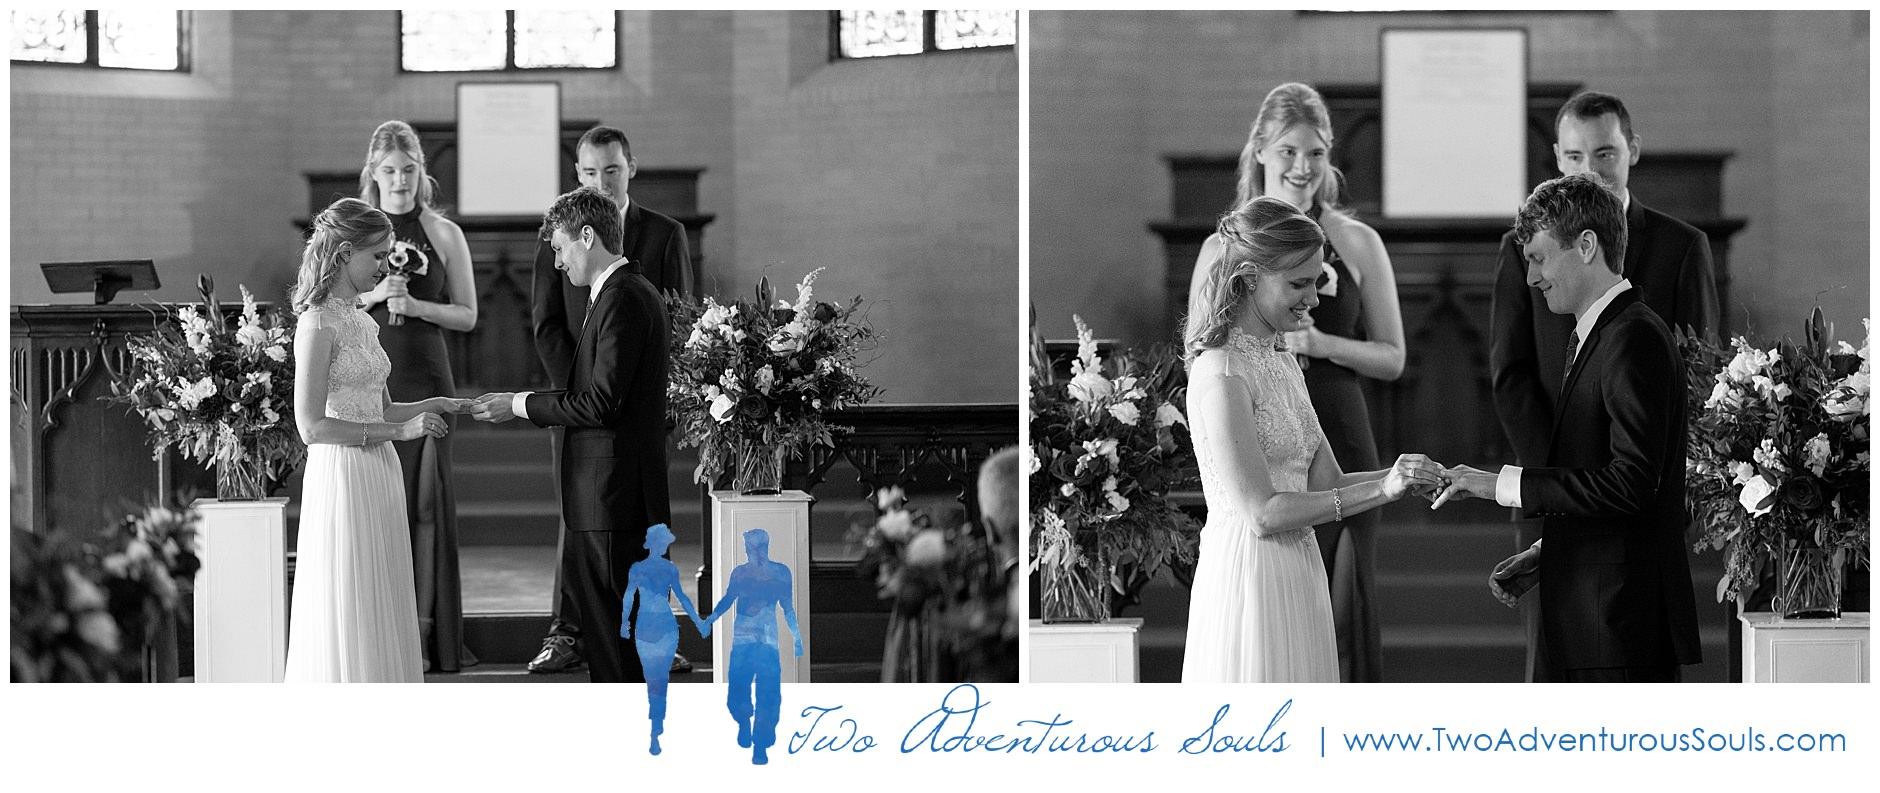 Grace Maine Photographers, Portland Maine Wedding Photographers, Two Adventurous Souls- 090719_0023.jpg